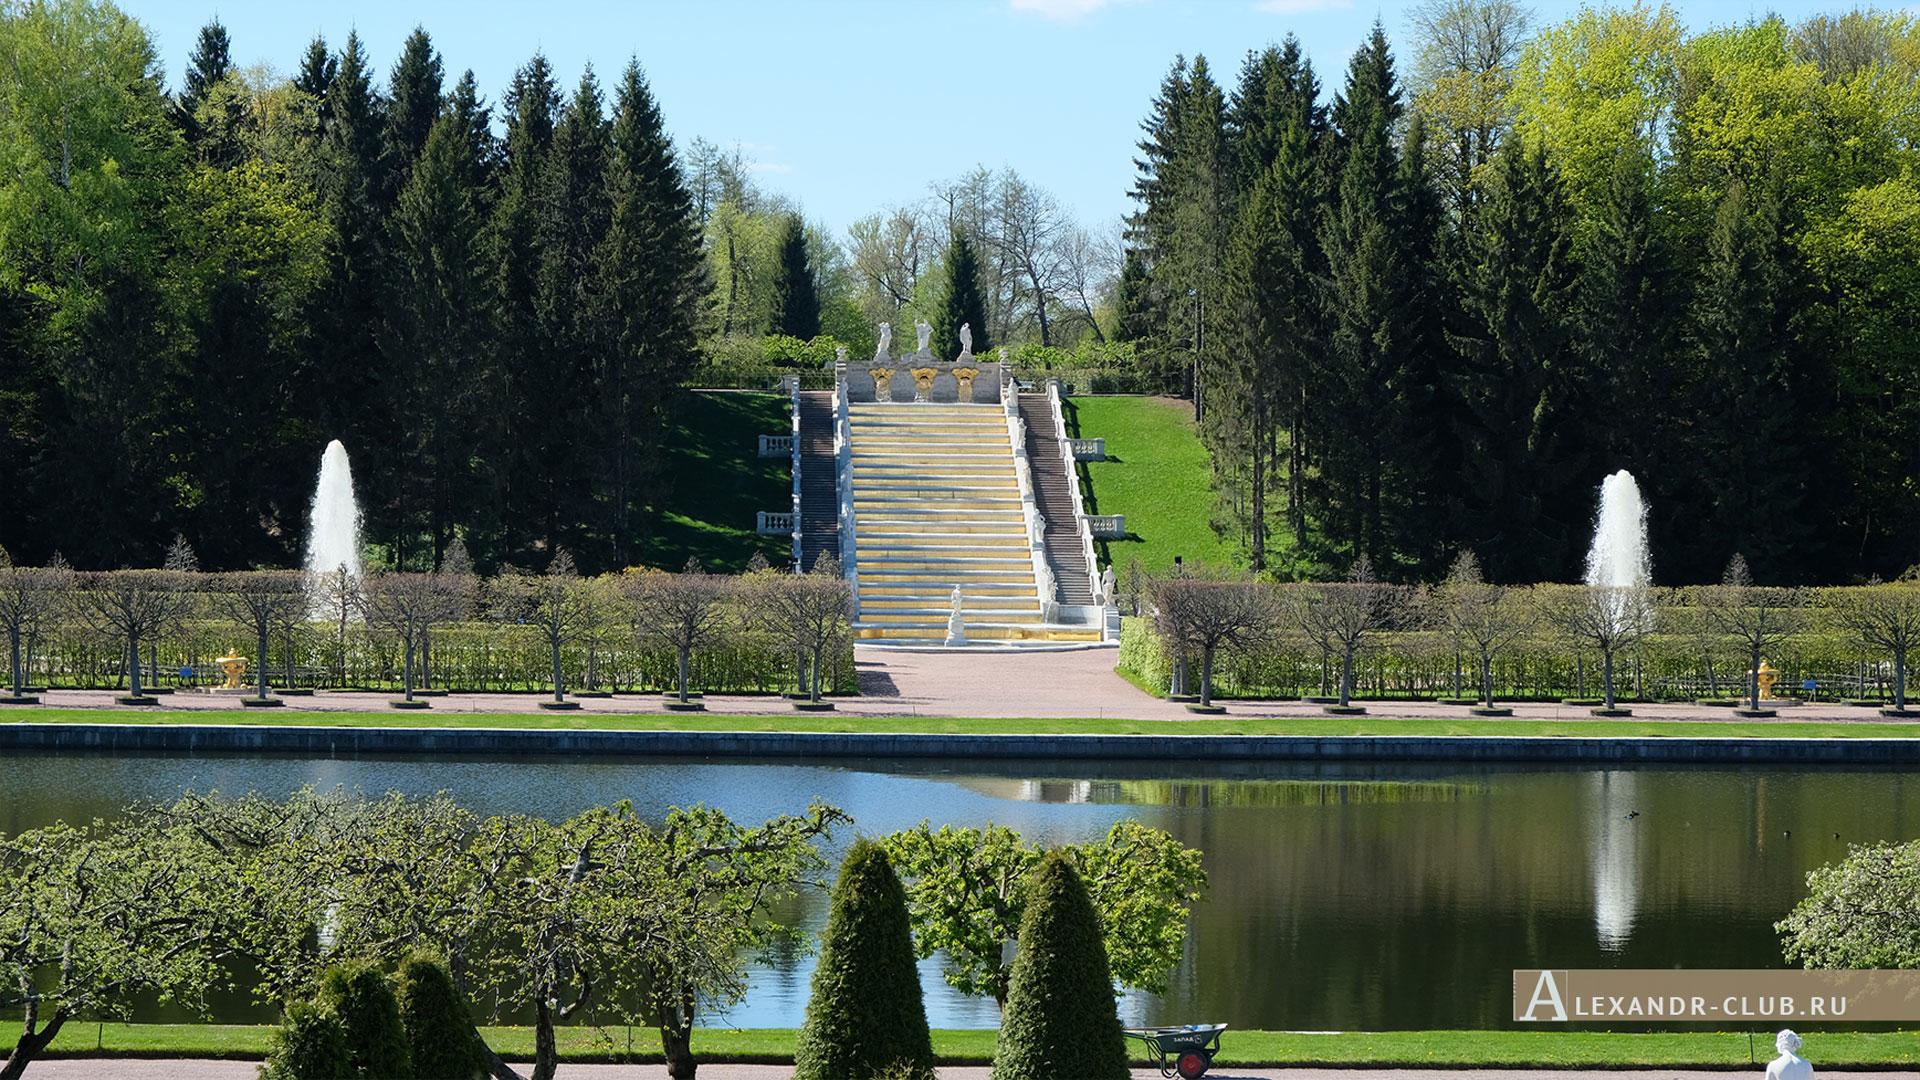 Петергоф, весна, Нижний парк, Марлинский пруд, каскад «Золотая гора»